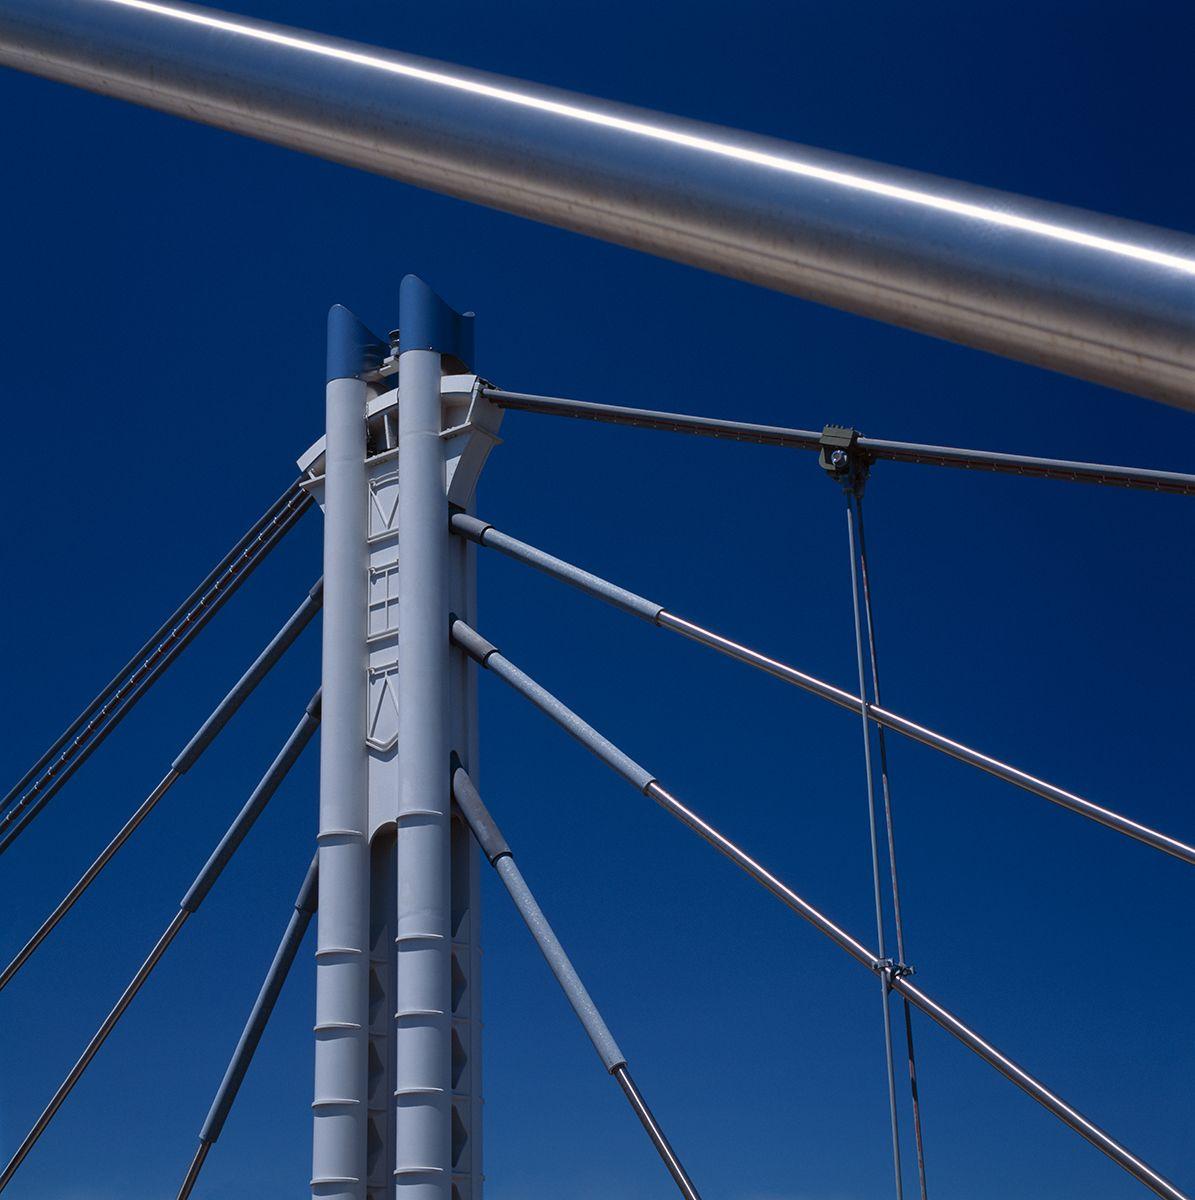 Bridge & Cables copy.jpg